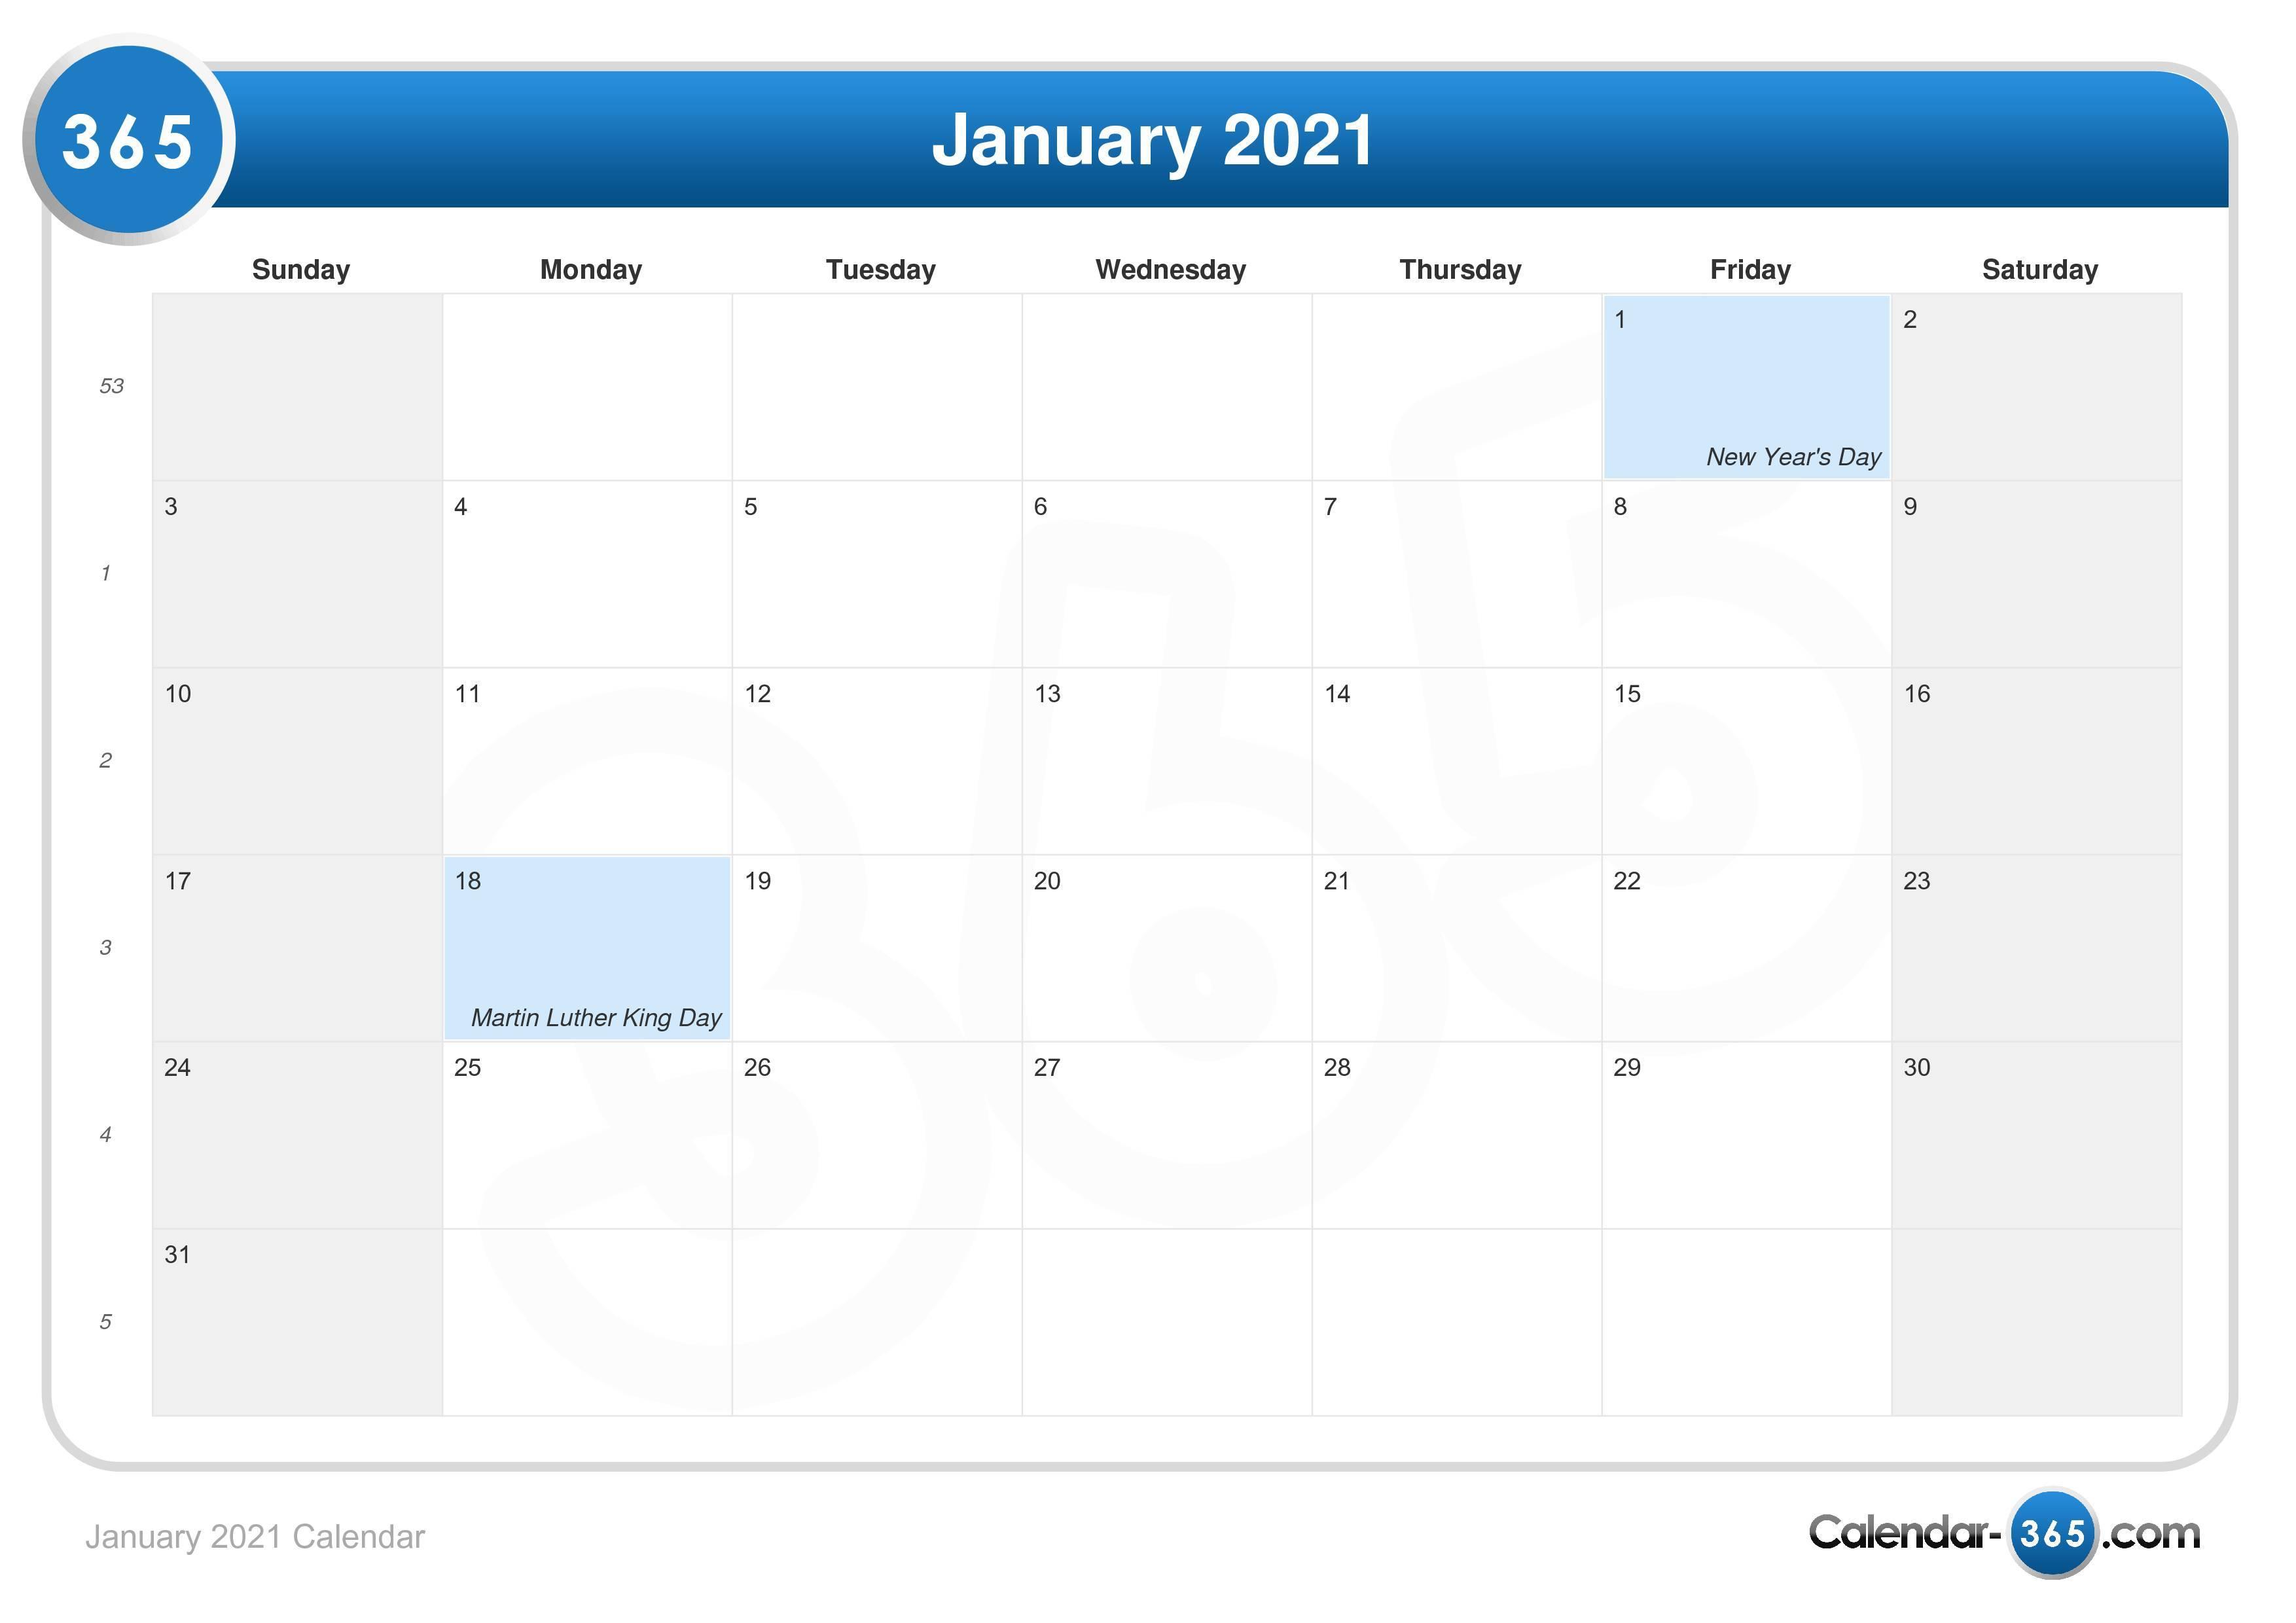 January 2021 Calendar For Columbus State Calendar 2021 20